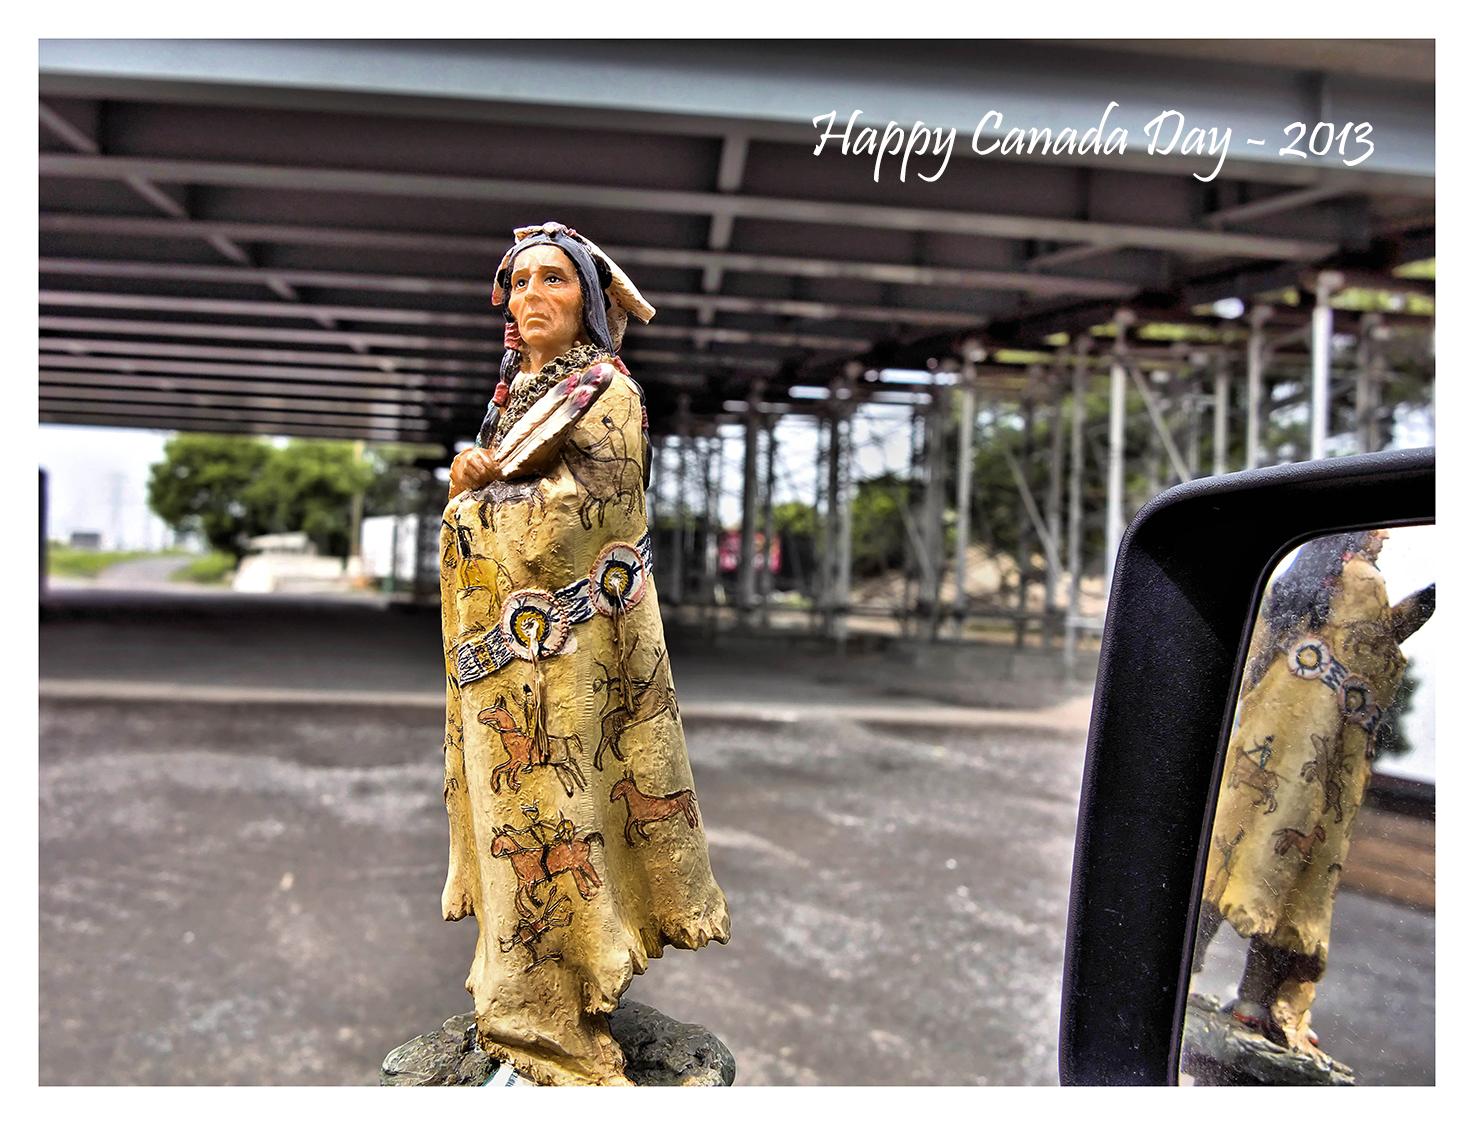 49. Indians_Buffalo Robe_Ottawa, Ontario, Canada Day - 2013, Carling and Kirkwood.jpg